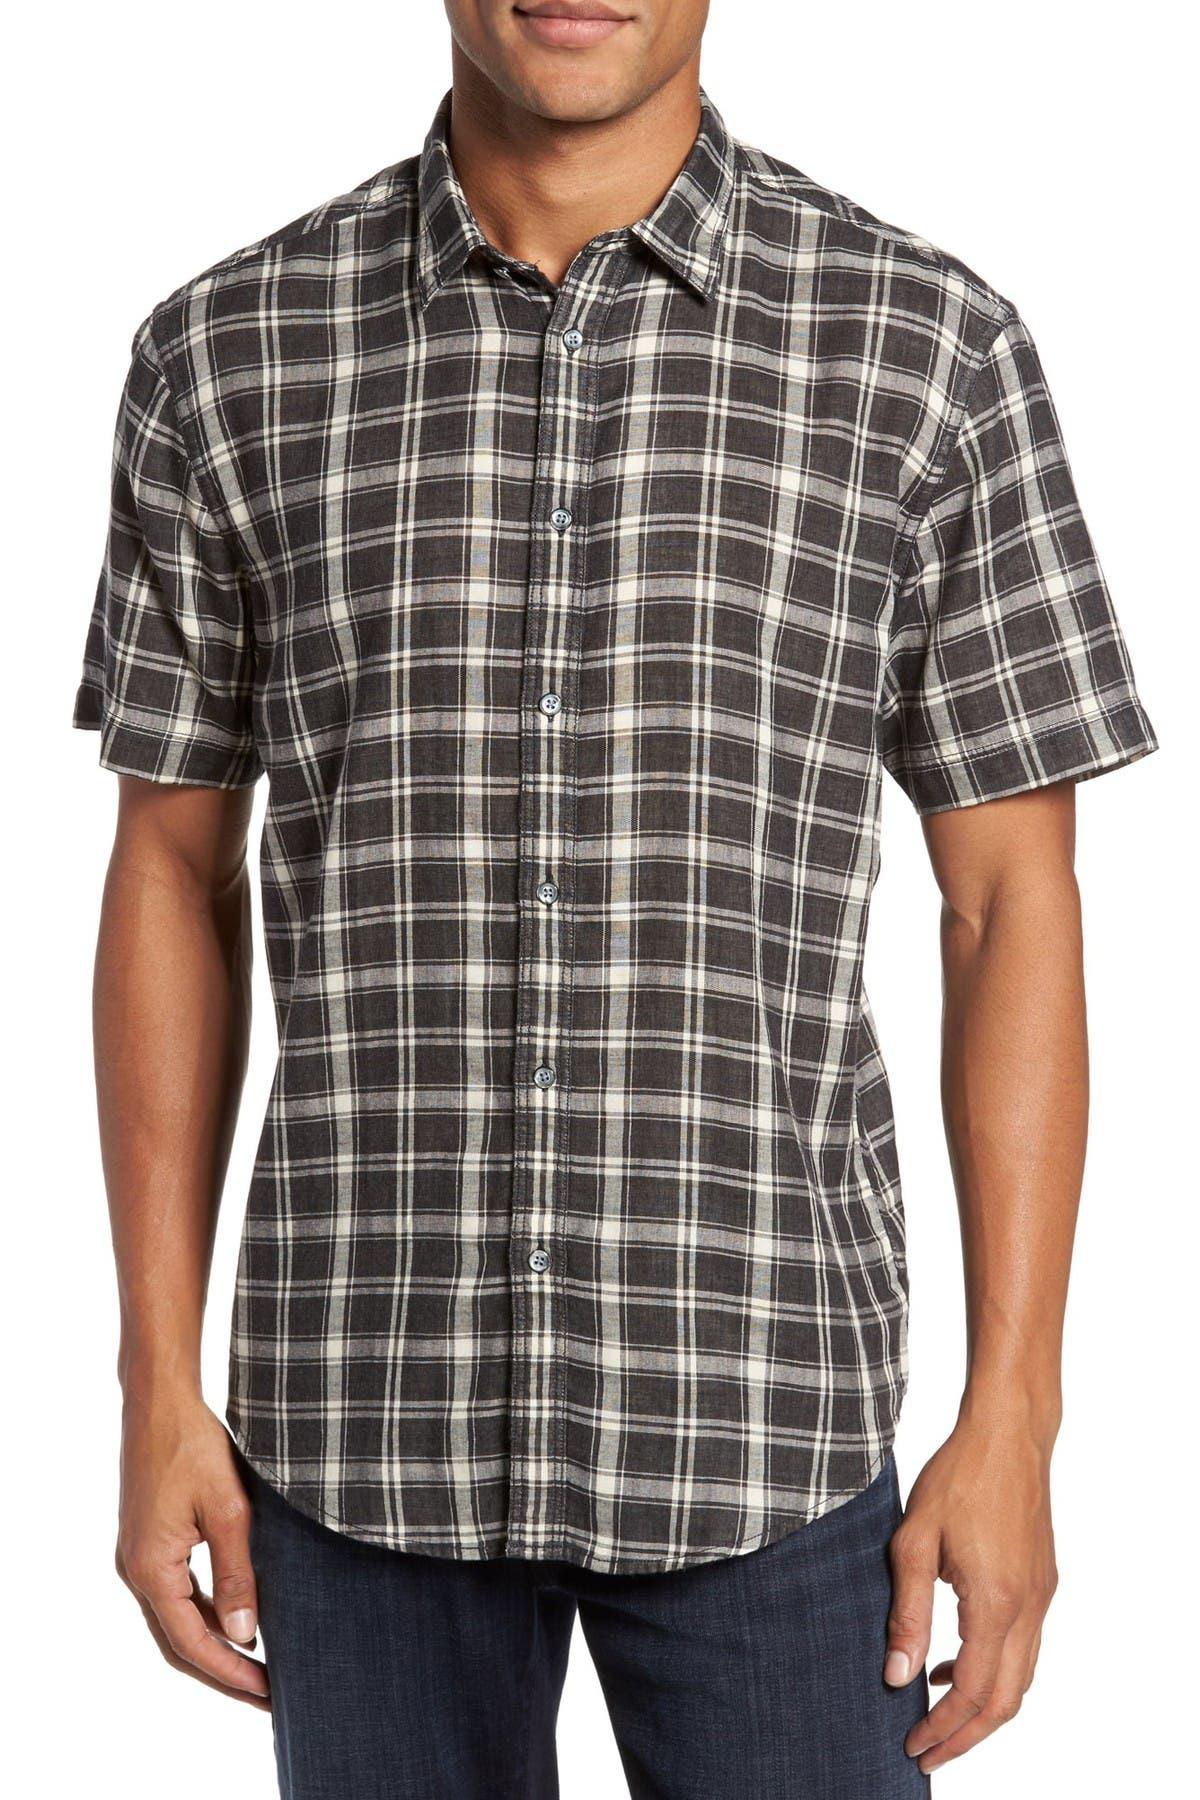 Image of COASTAORO Hansen Plaid Regular Fit Sport Shirt